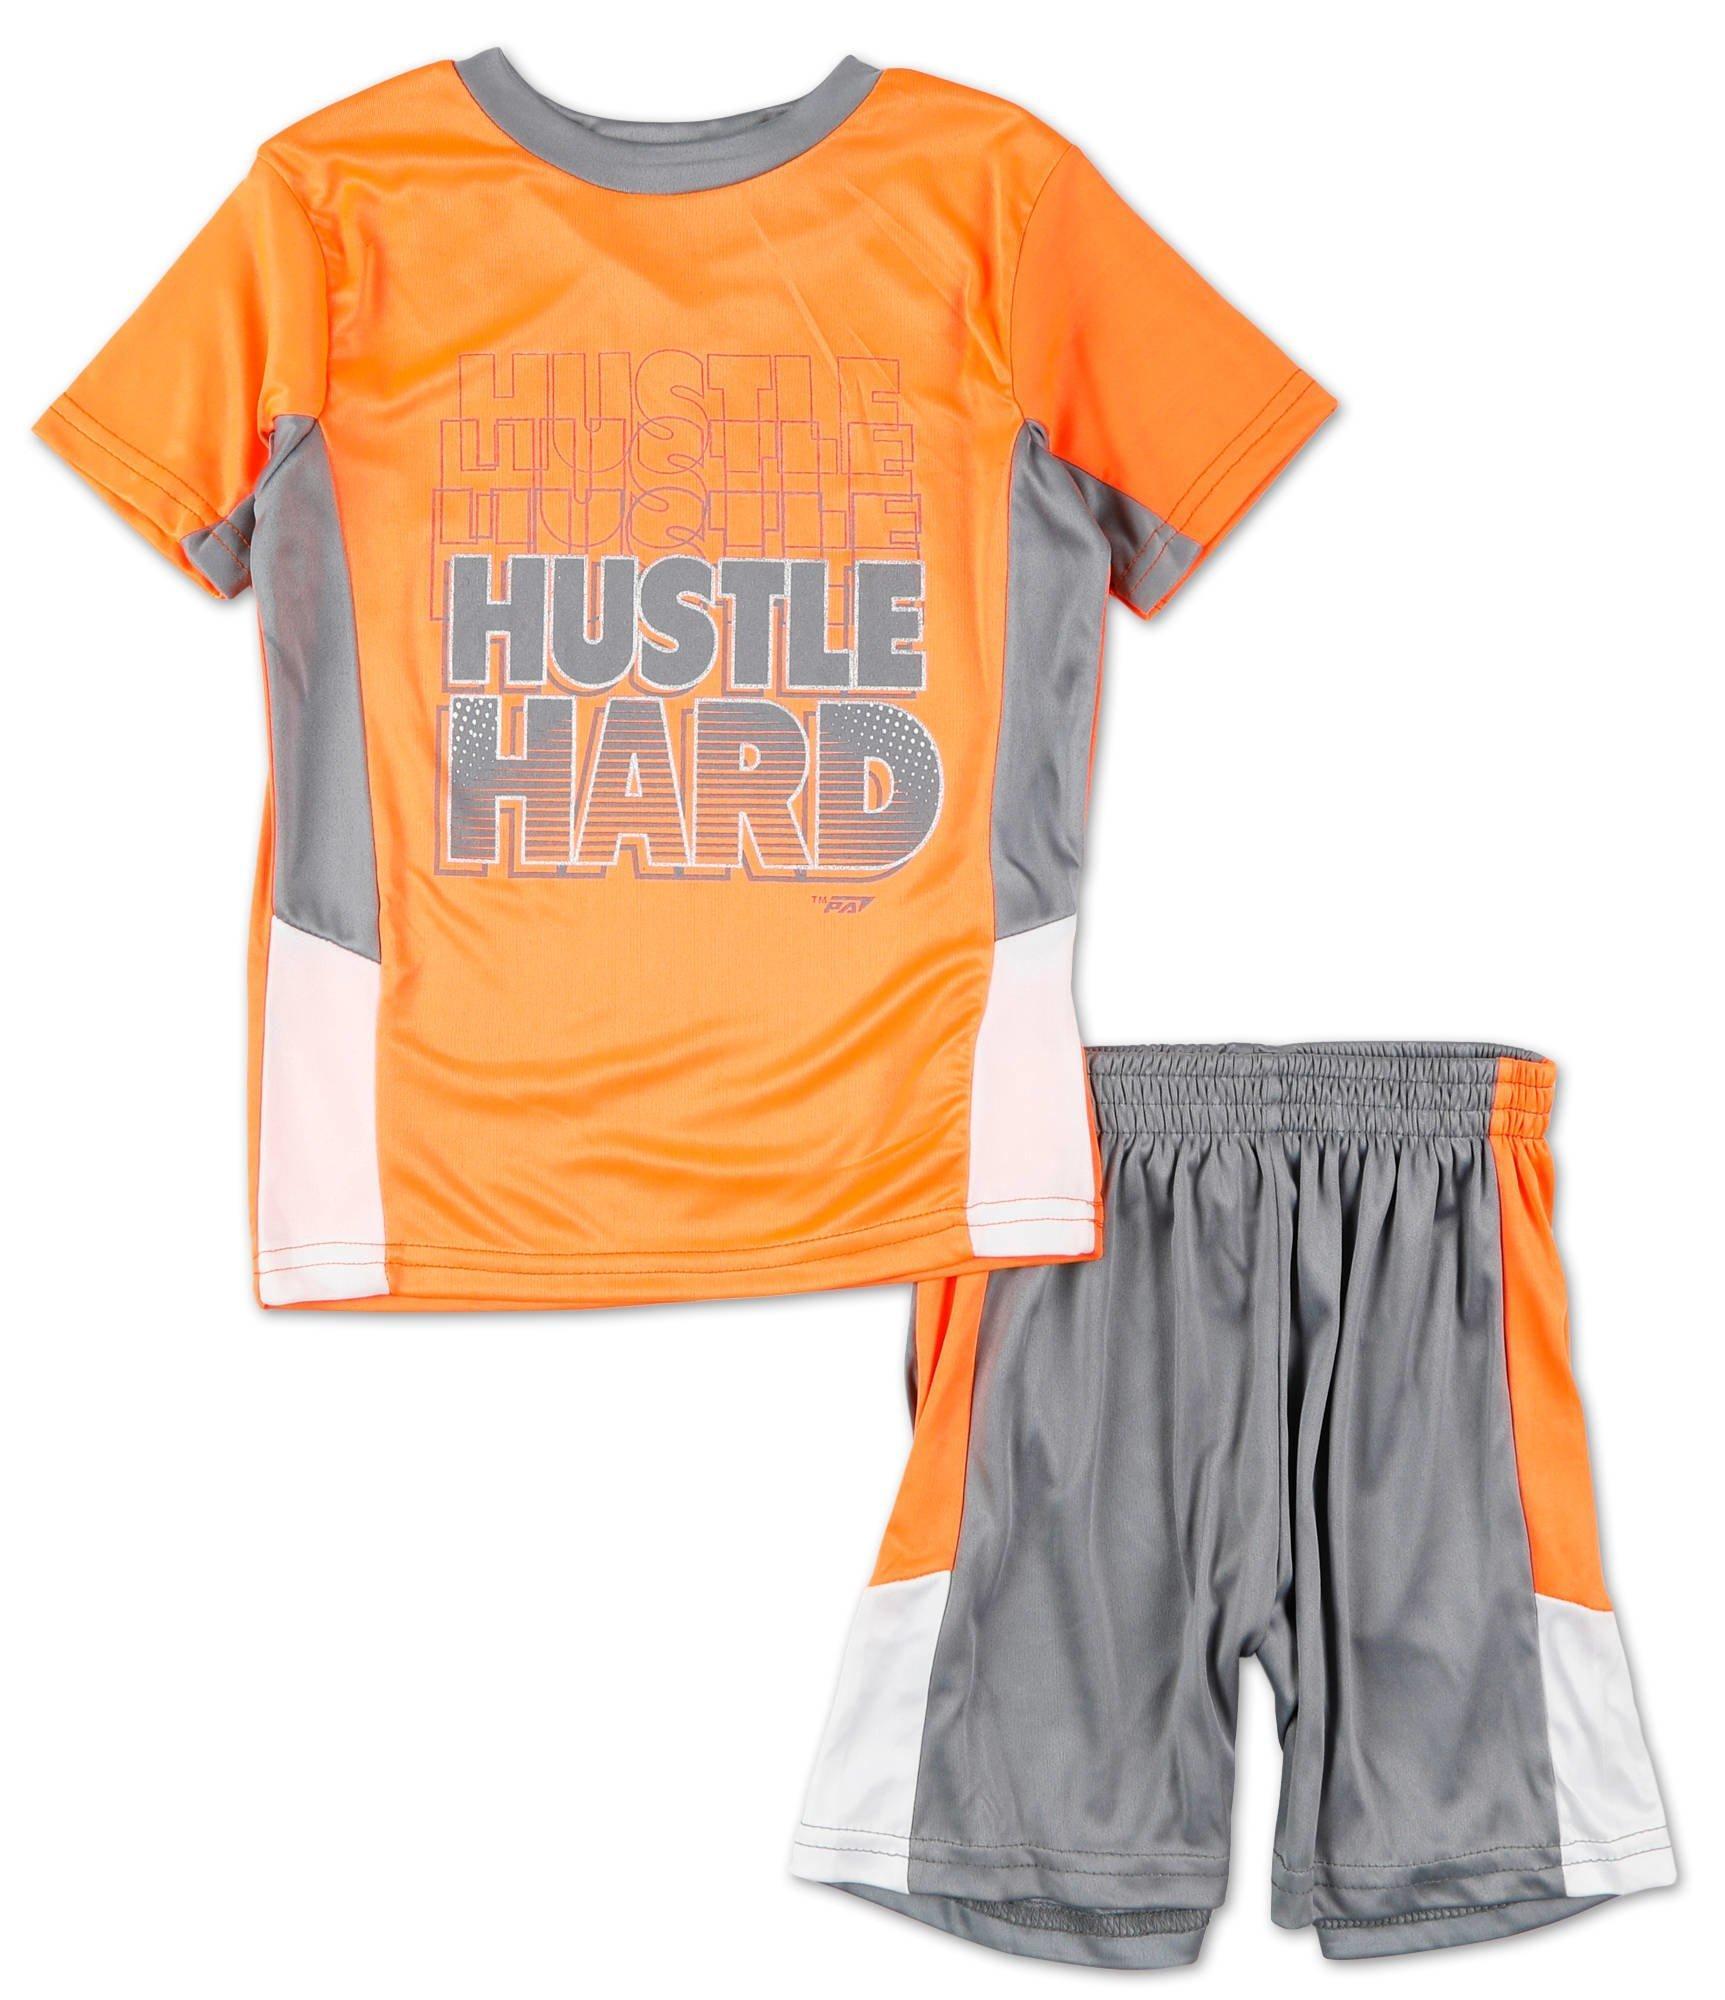 Pro Athlete Boys Hustle 2-Piece Shorts Set Outfit